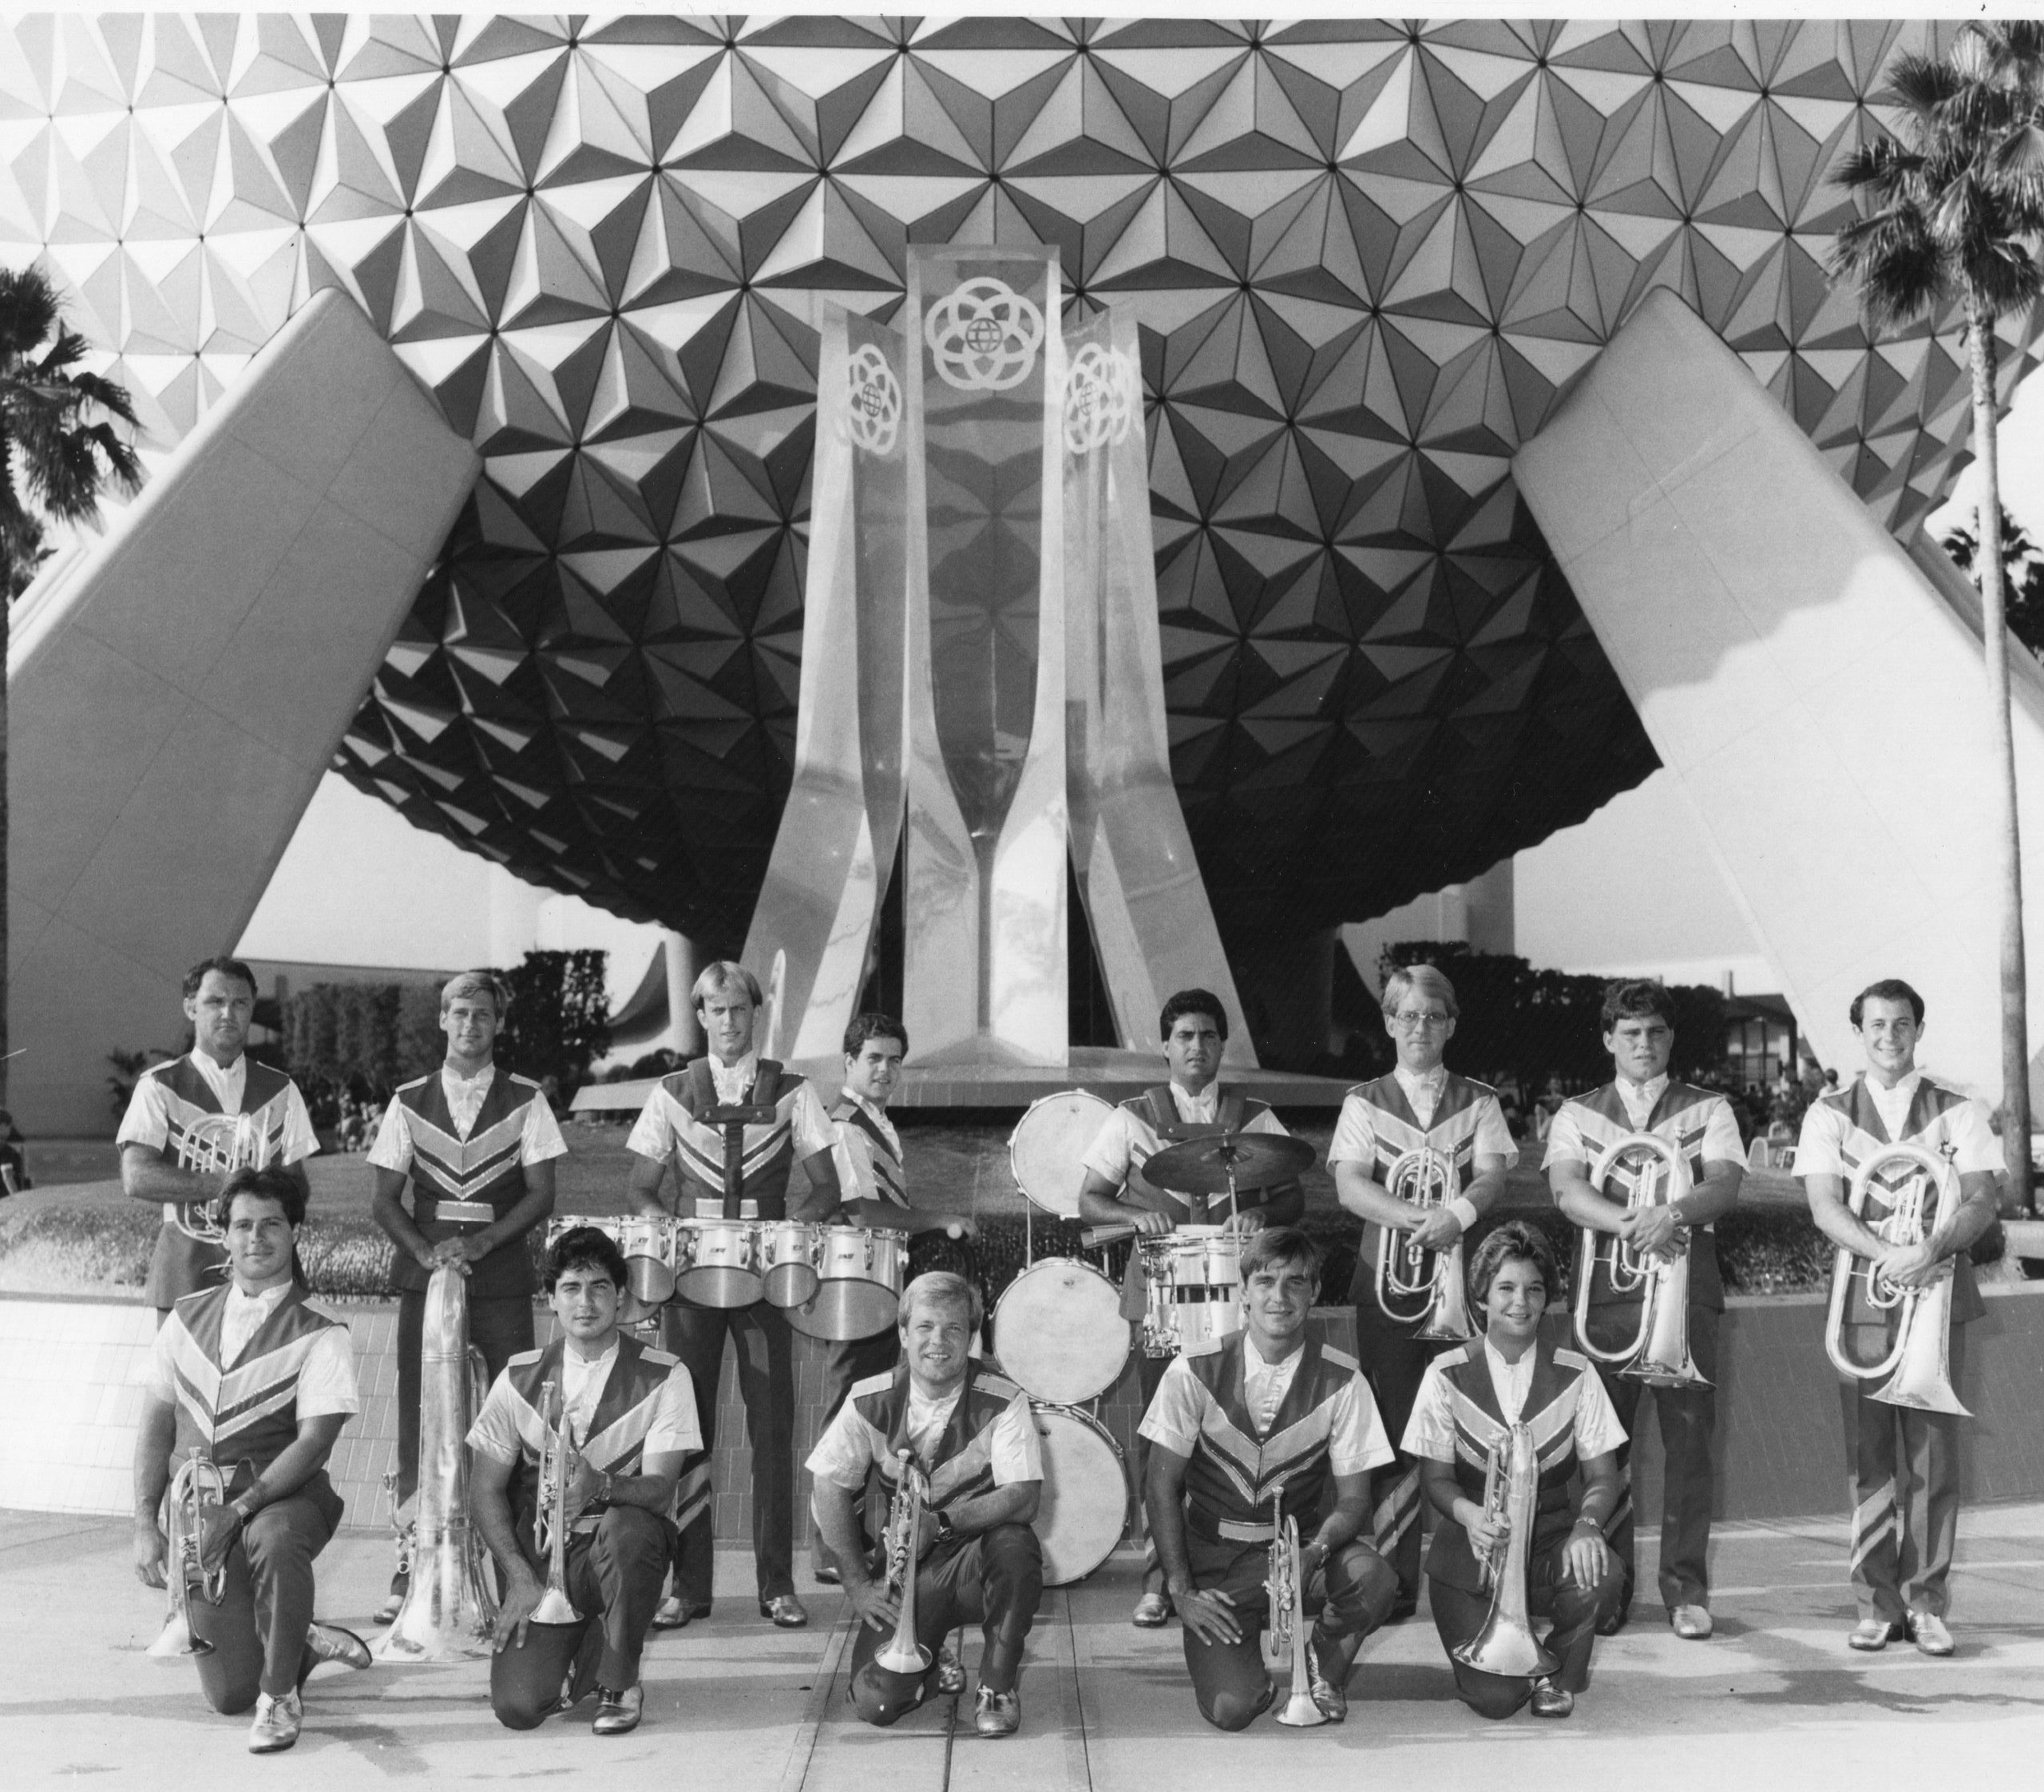 Future Corps (1982)